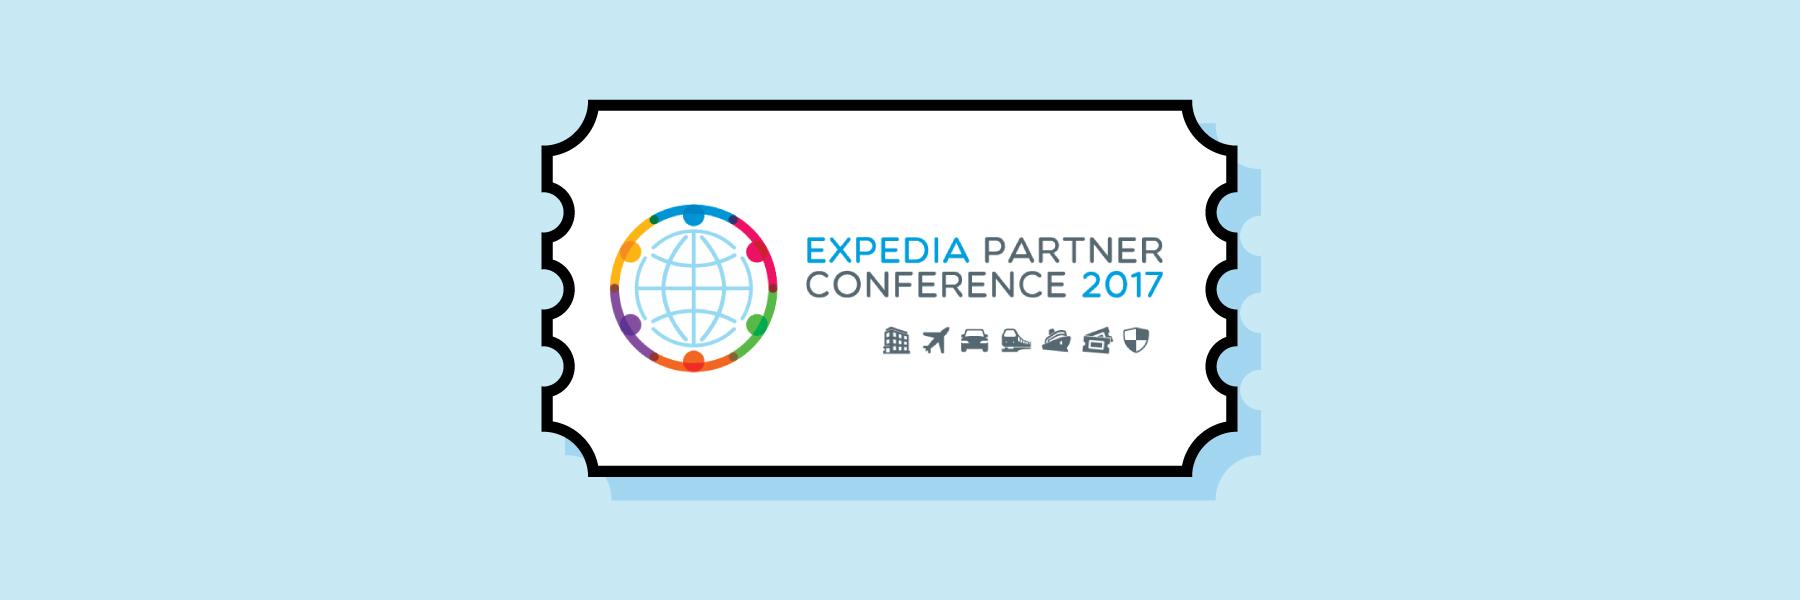 FareHarbor Expedia Partner Conference